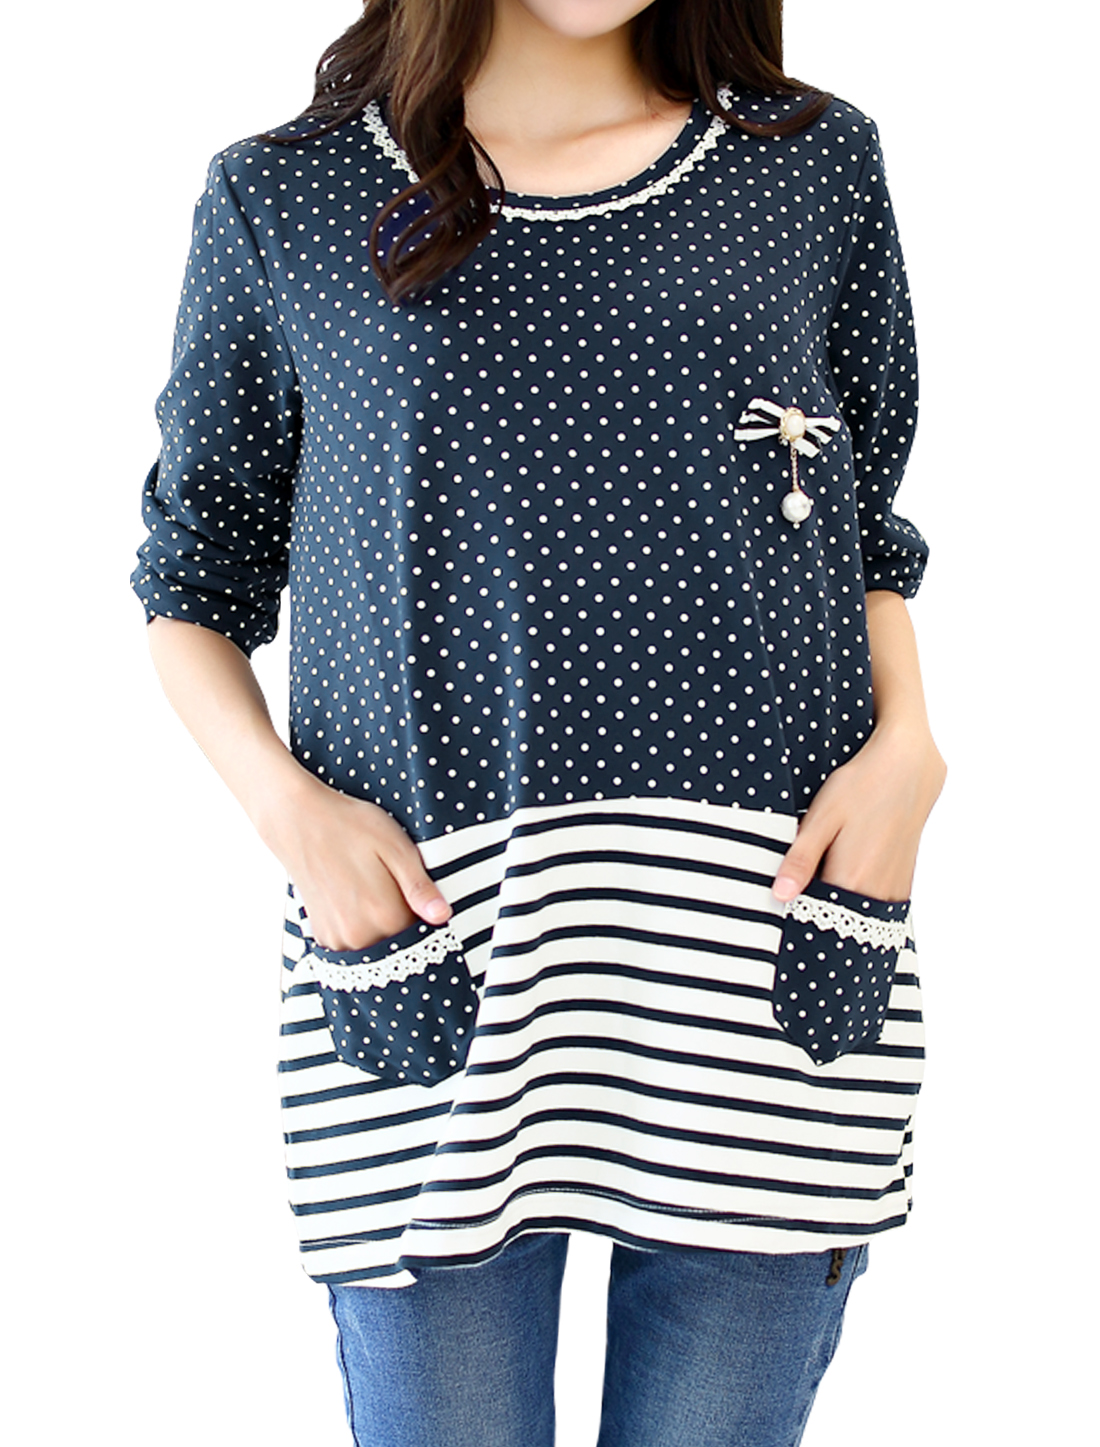 Pregnant Women Long Sleeves Bowknot Decor Dots Stripes Top Blue XS